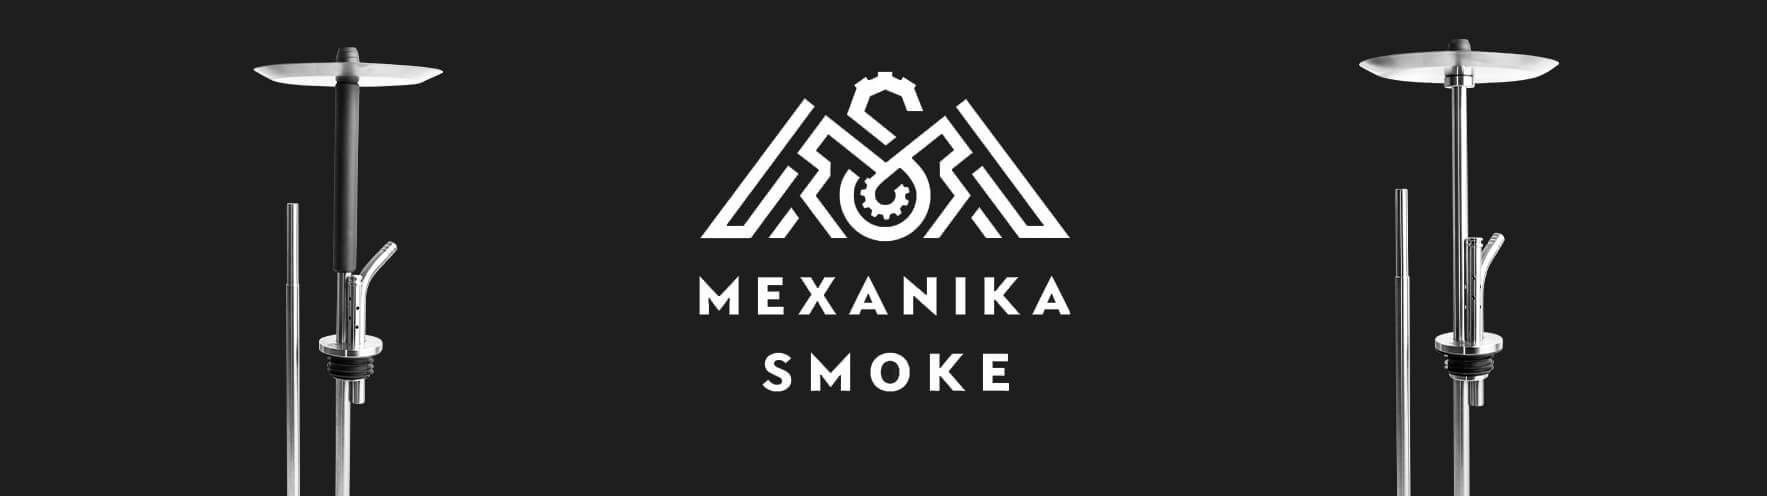 Кальяны Mexanika Smoke официальный сайт